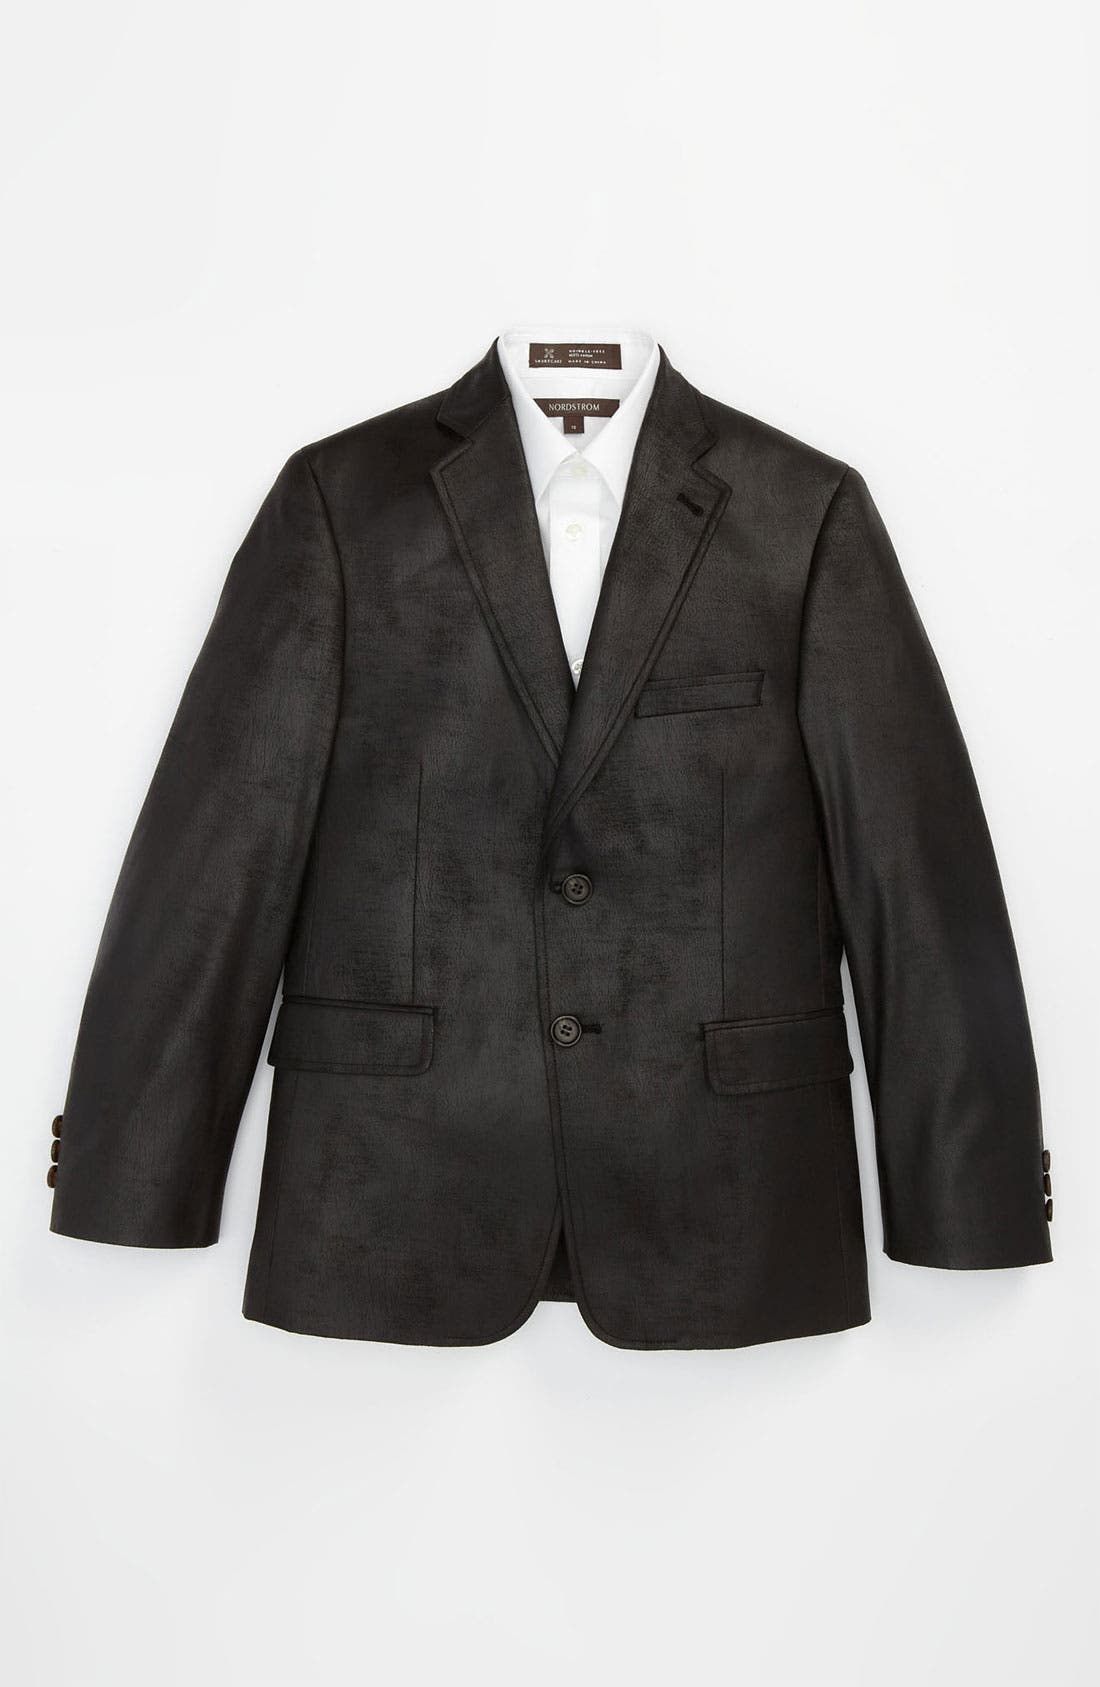 Alternate Image 1 Selected - Joseph Abboud Faux Leather Blazer (Big Boys)